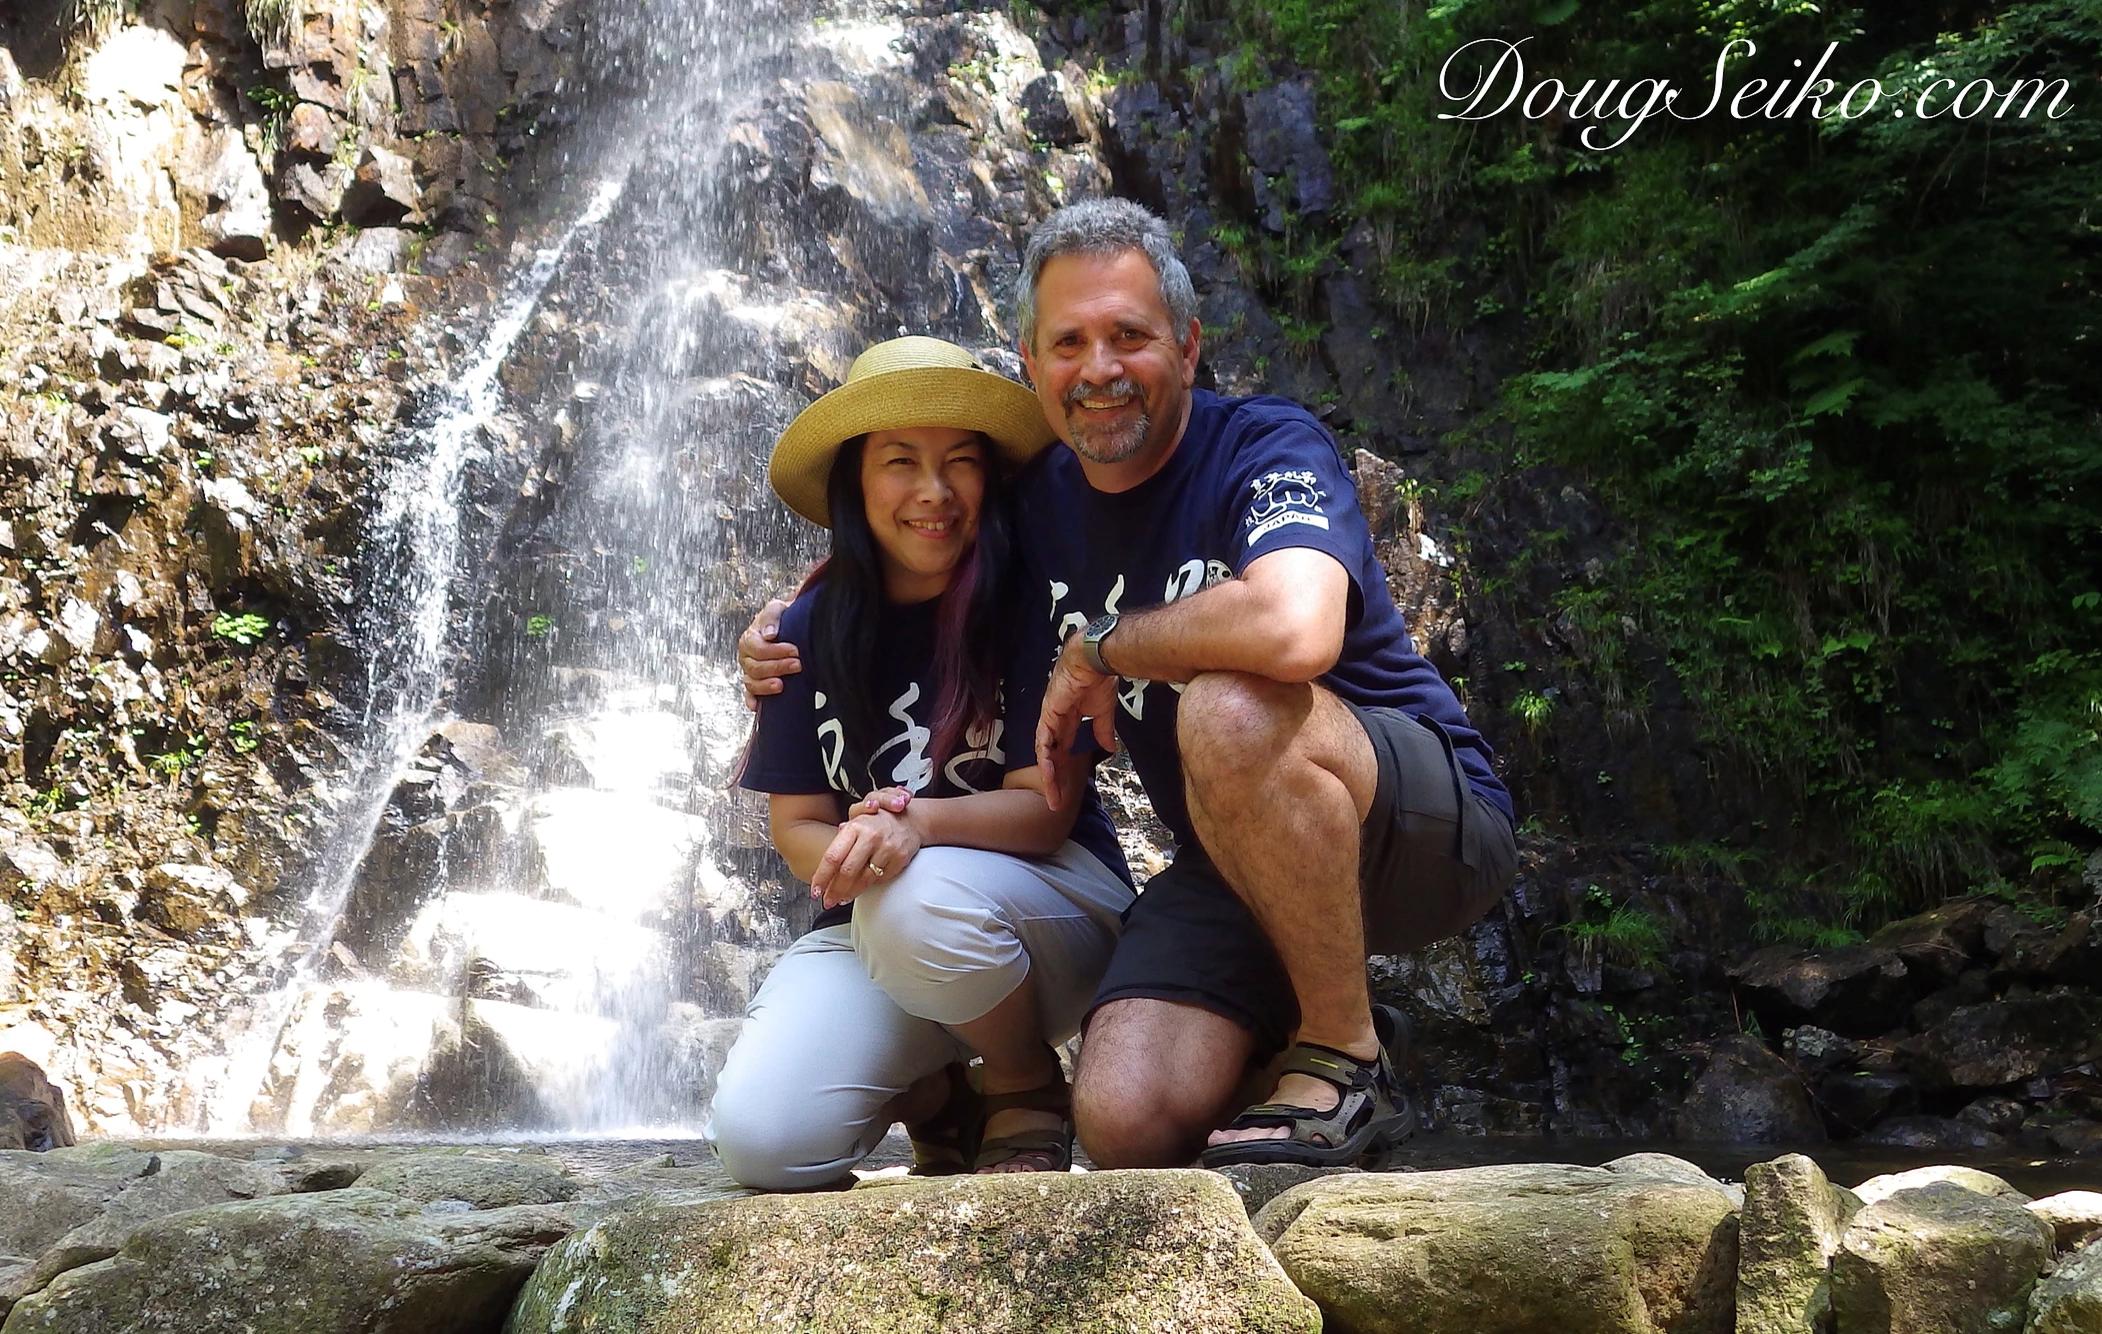 Doug & Seiko Werts - Classical Voice Duo